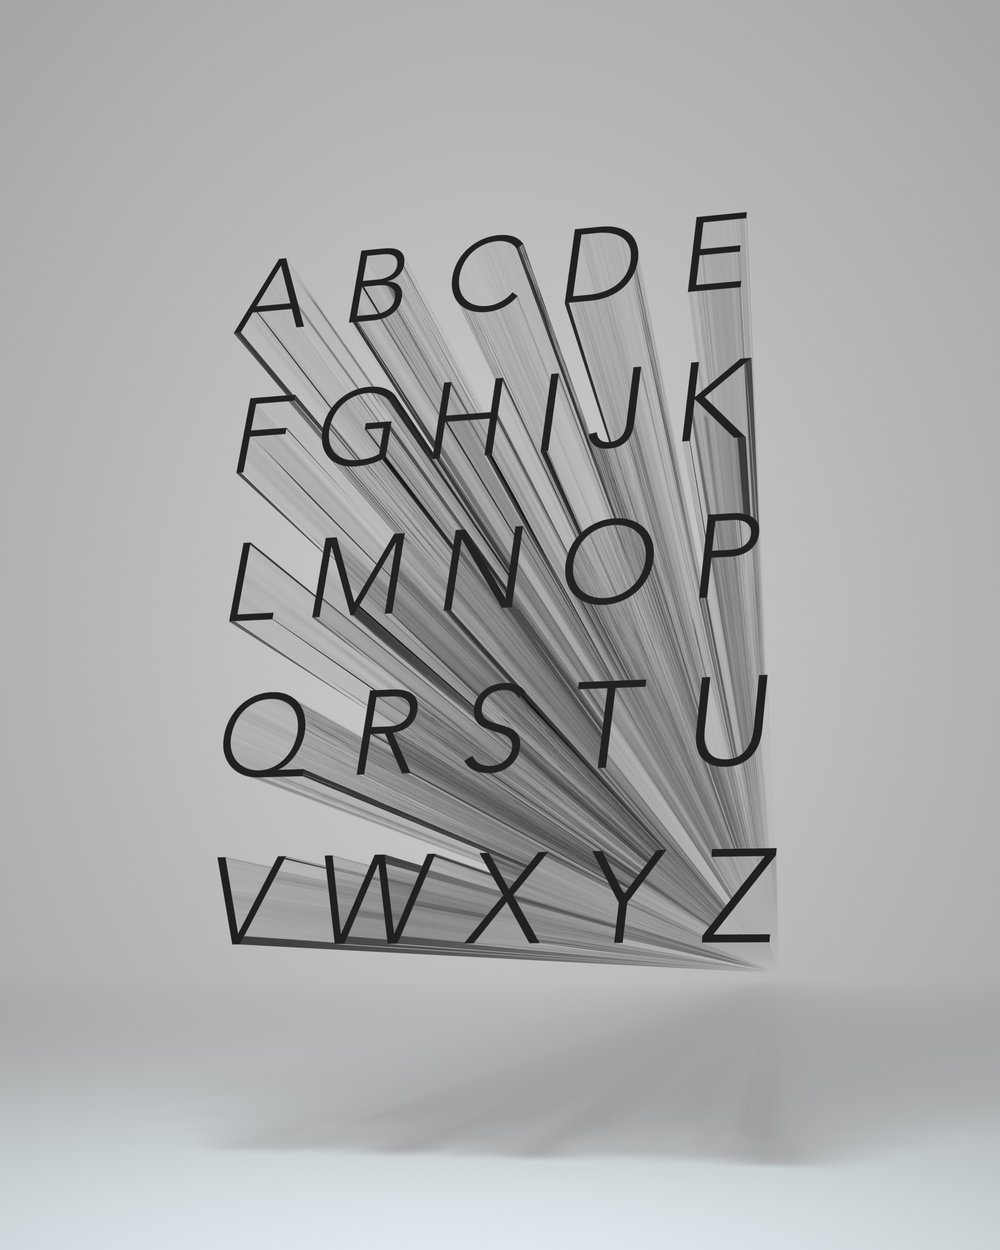 alphabet_bw_02.jpg